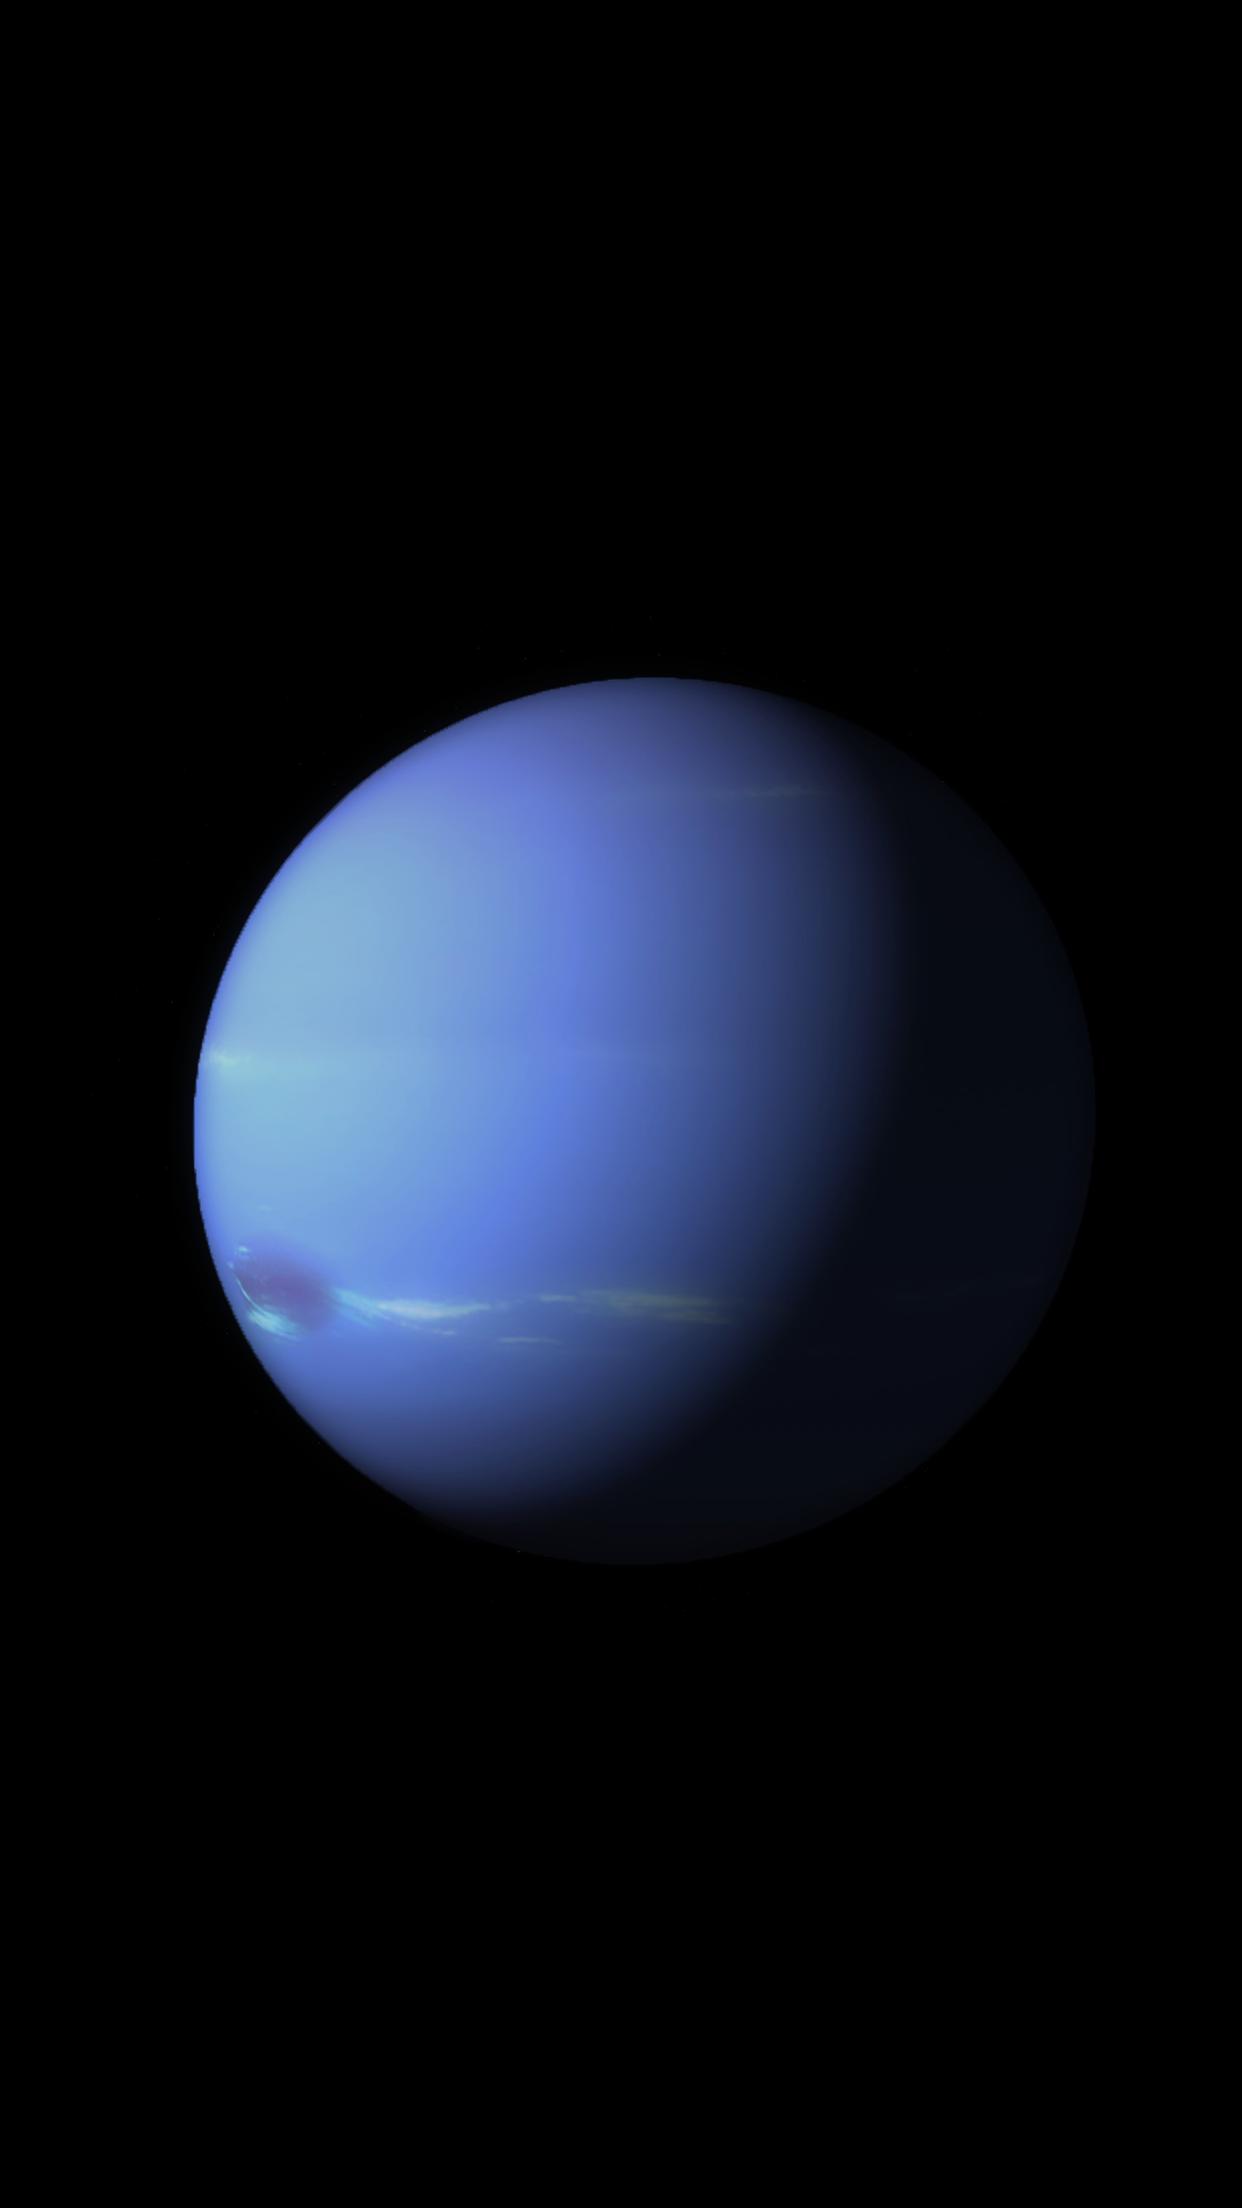 ios 9 planete neptune 3Wallpapers iPhone Parallax iOS 9 Planet Neptune